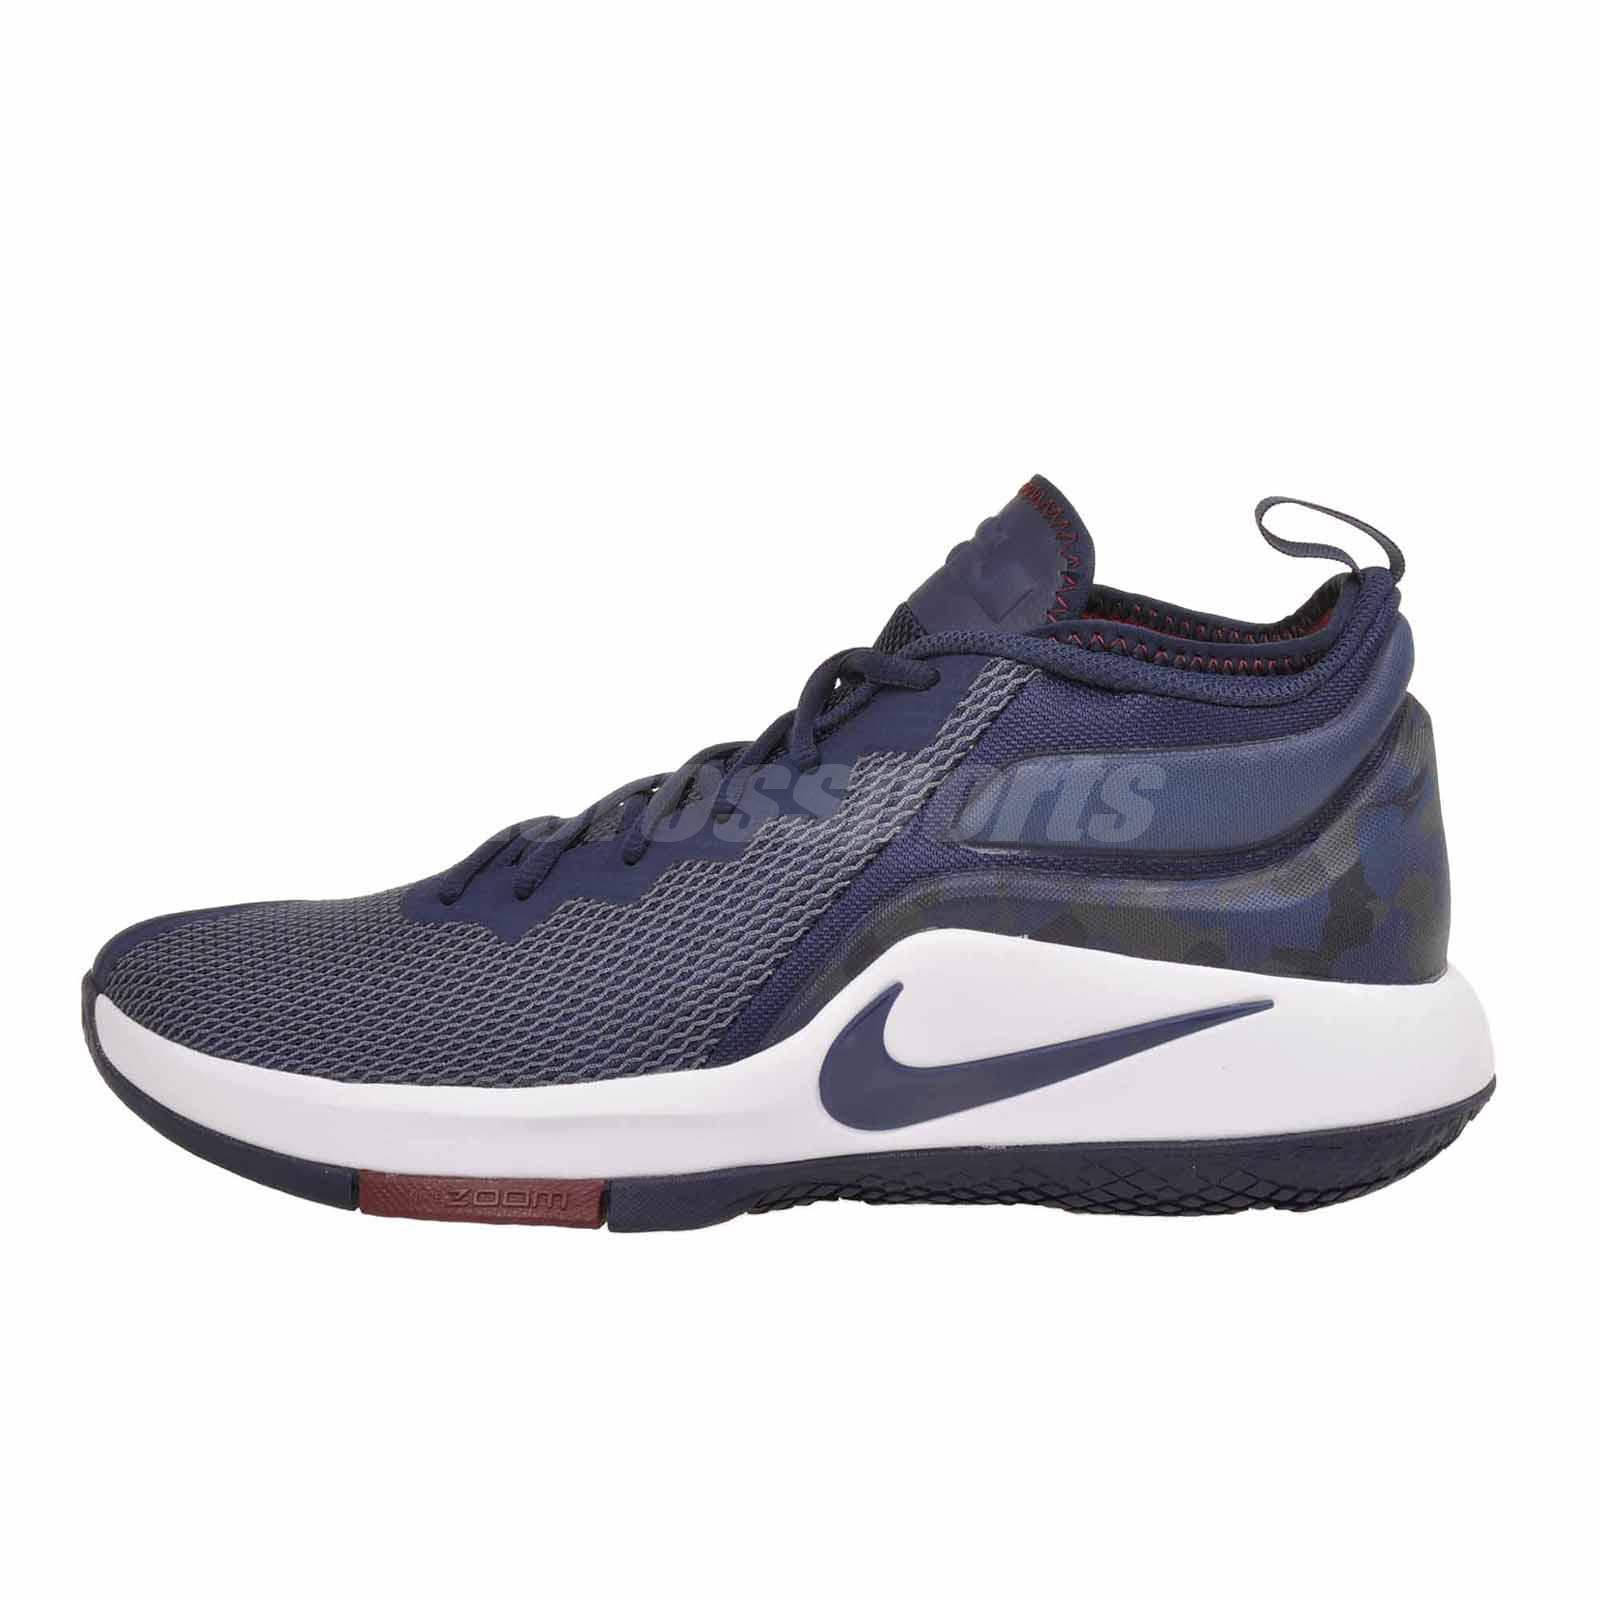 6b0be2a18bda9 discount nike lebron witness ii basketball mens shoes college navy 942518  406 eb798 16683